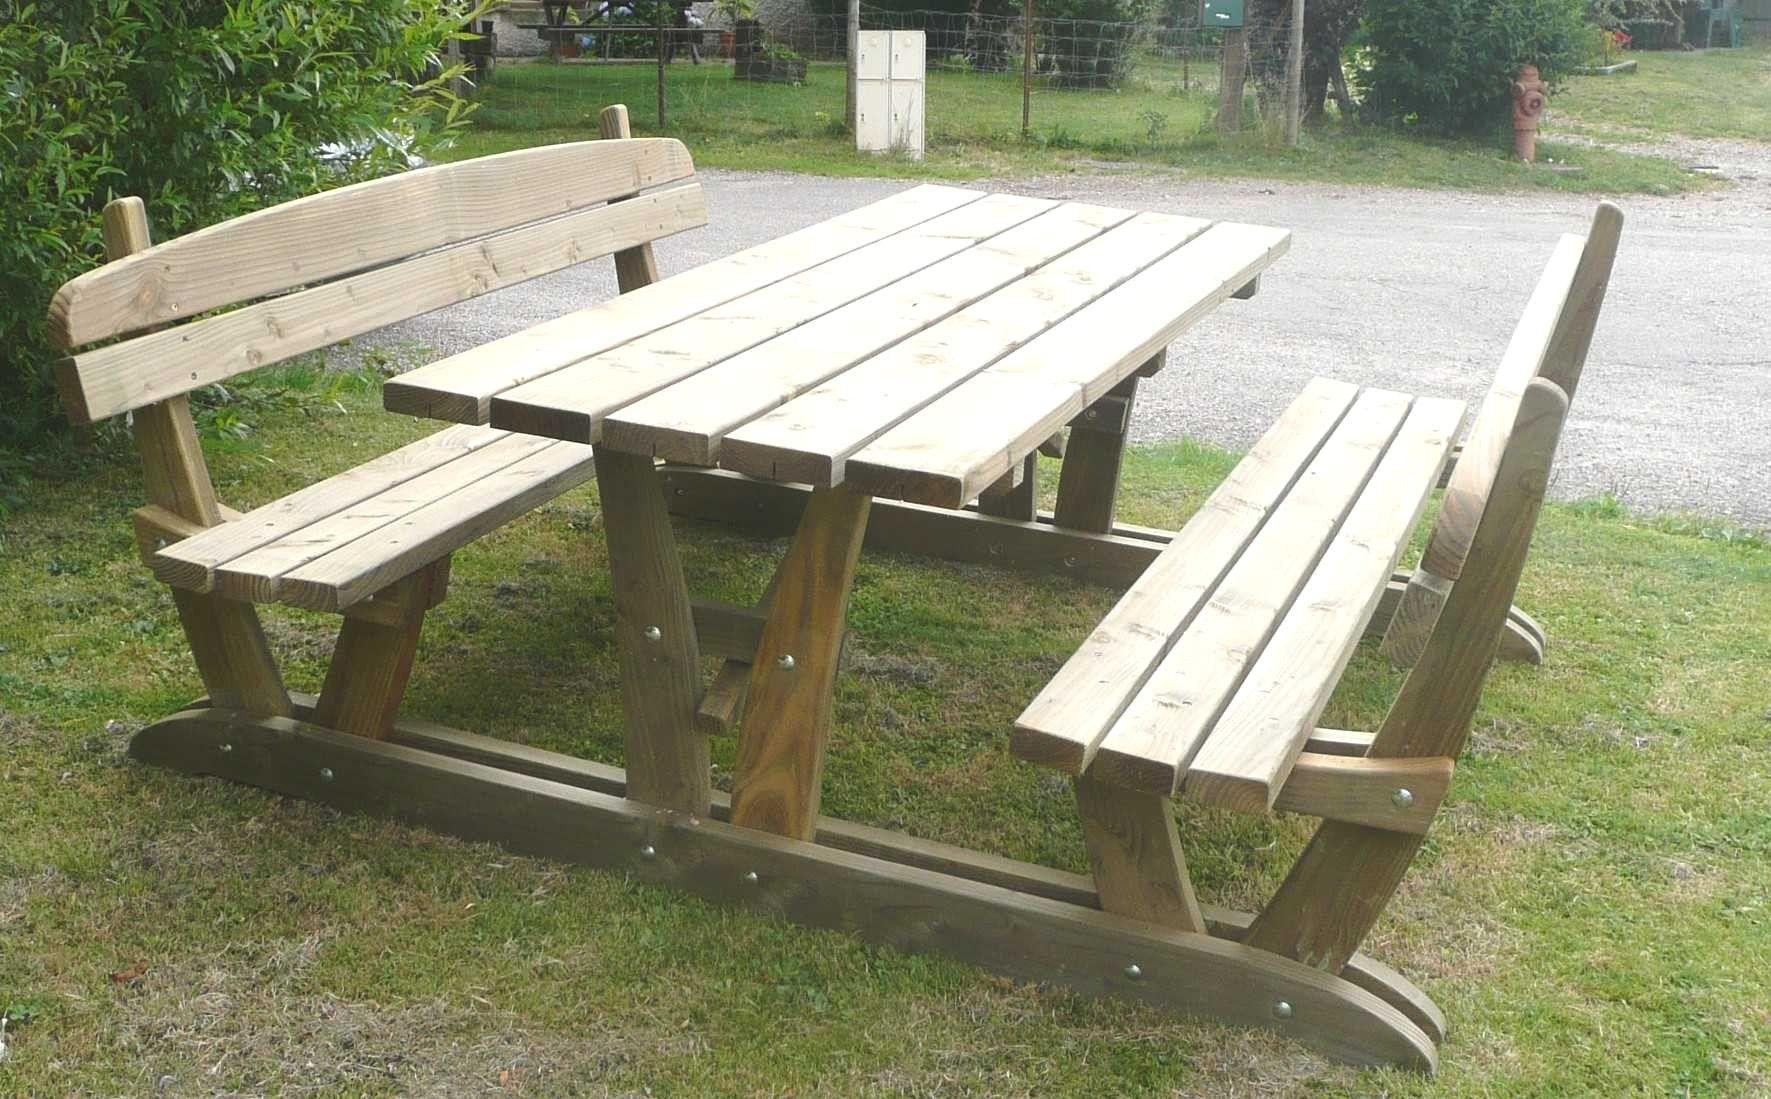 Fresh Banc Exterieur Castorama Indoor Garden Outdoor Tables Picnic Table